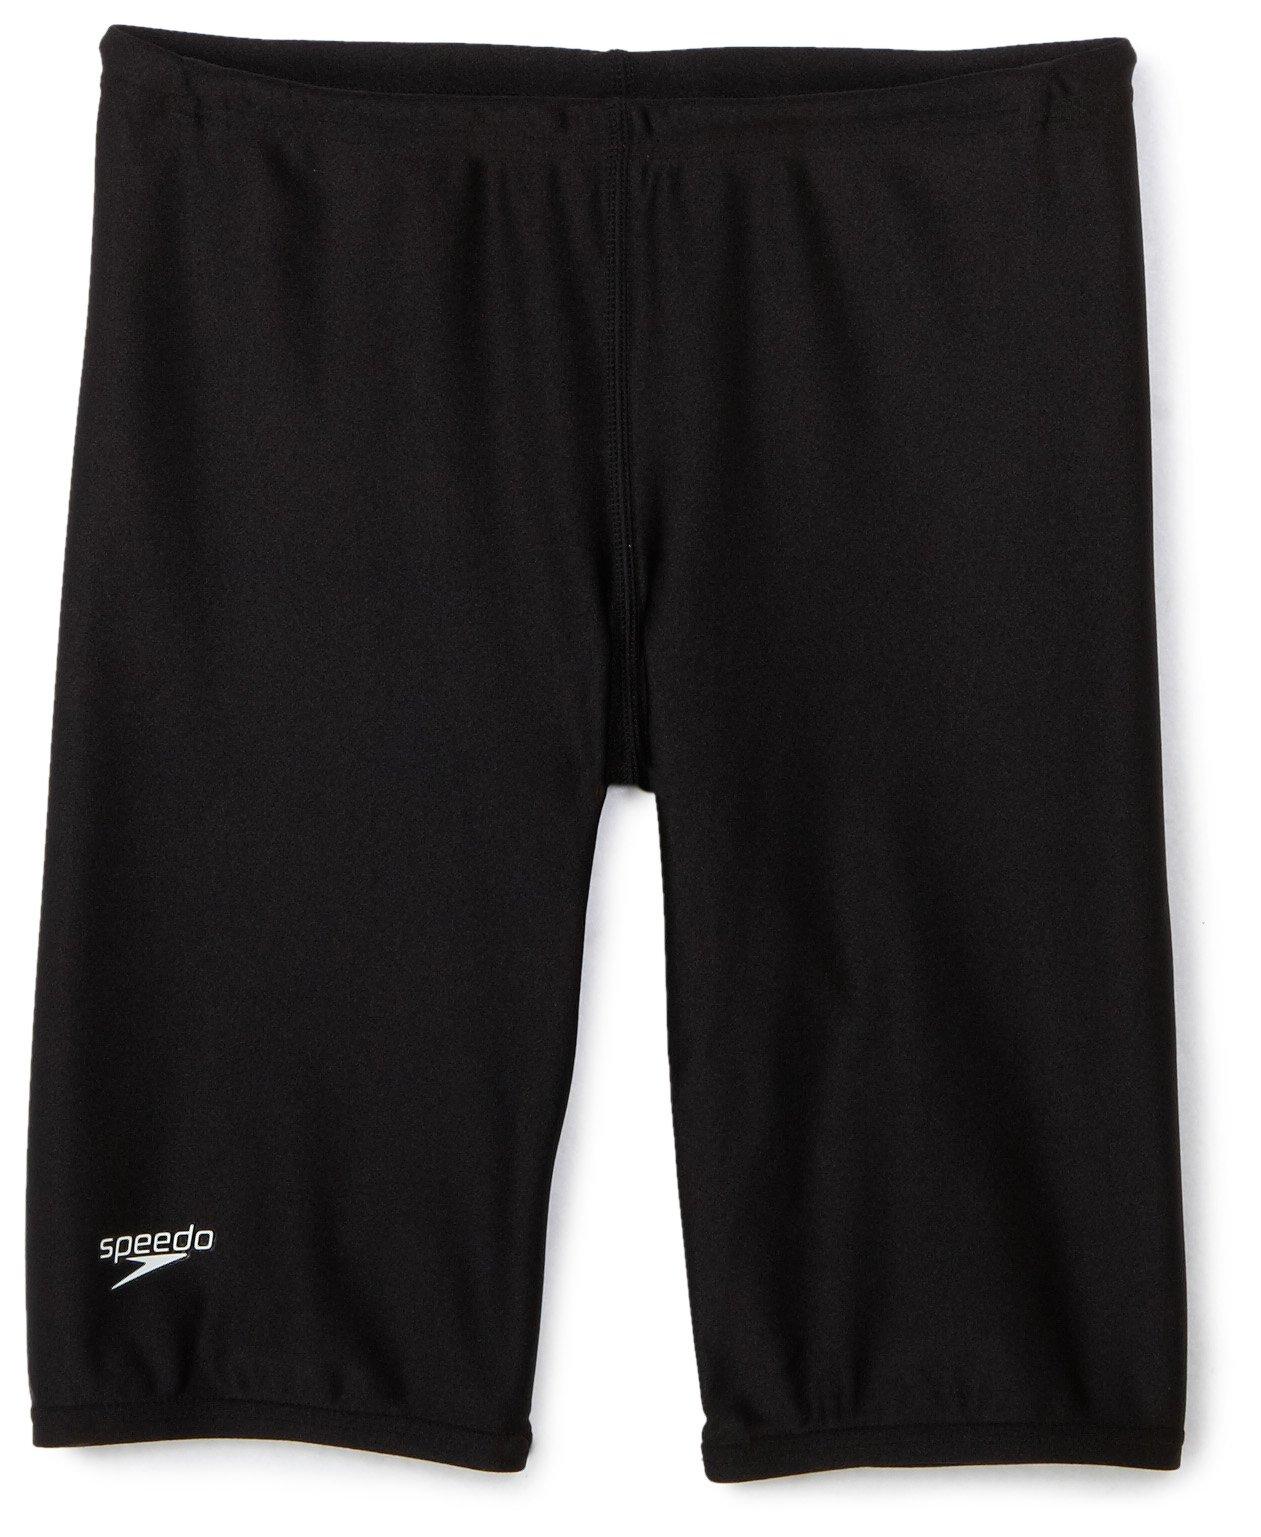 Speedo Boys' Jammer Swimsuit – PowerFlex Eco Solid